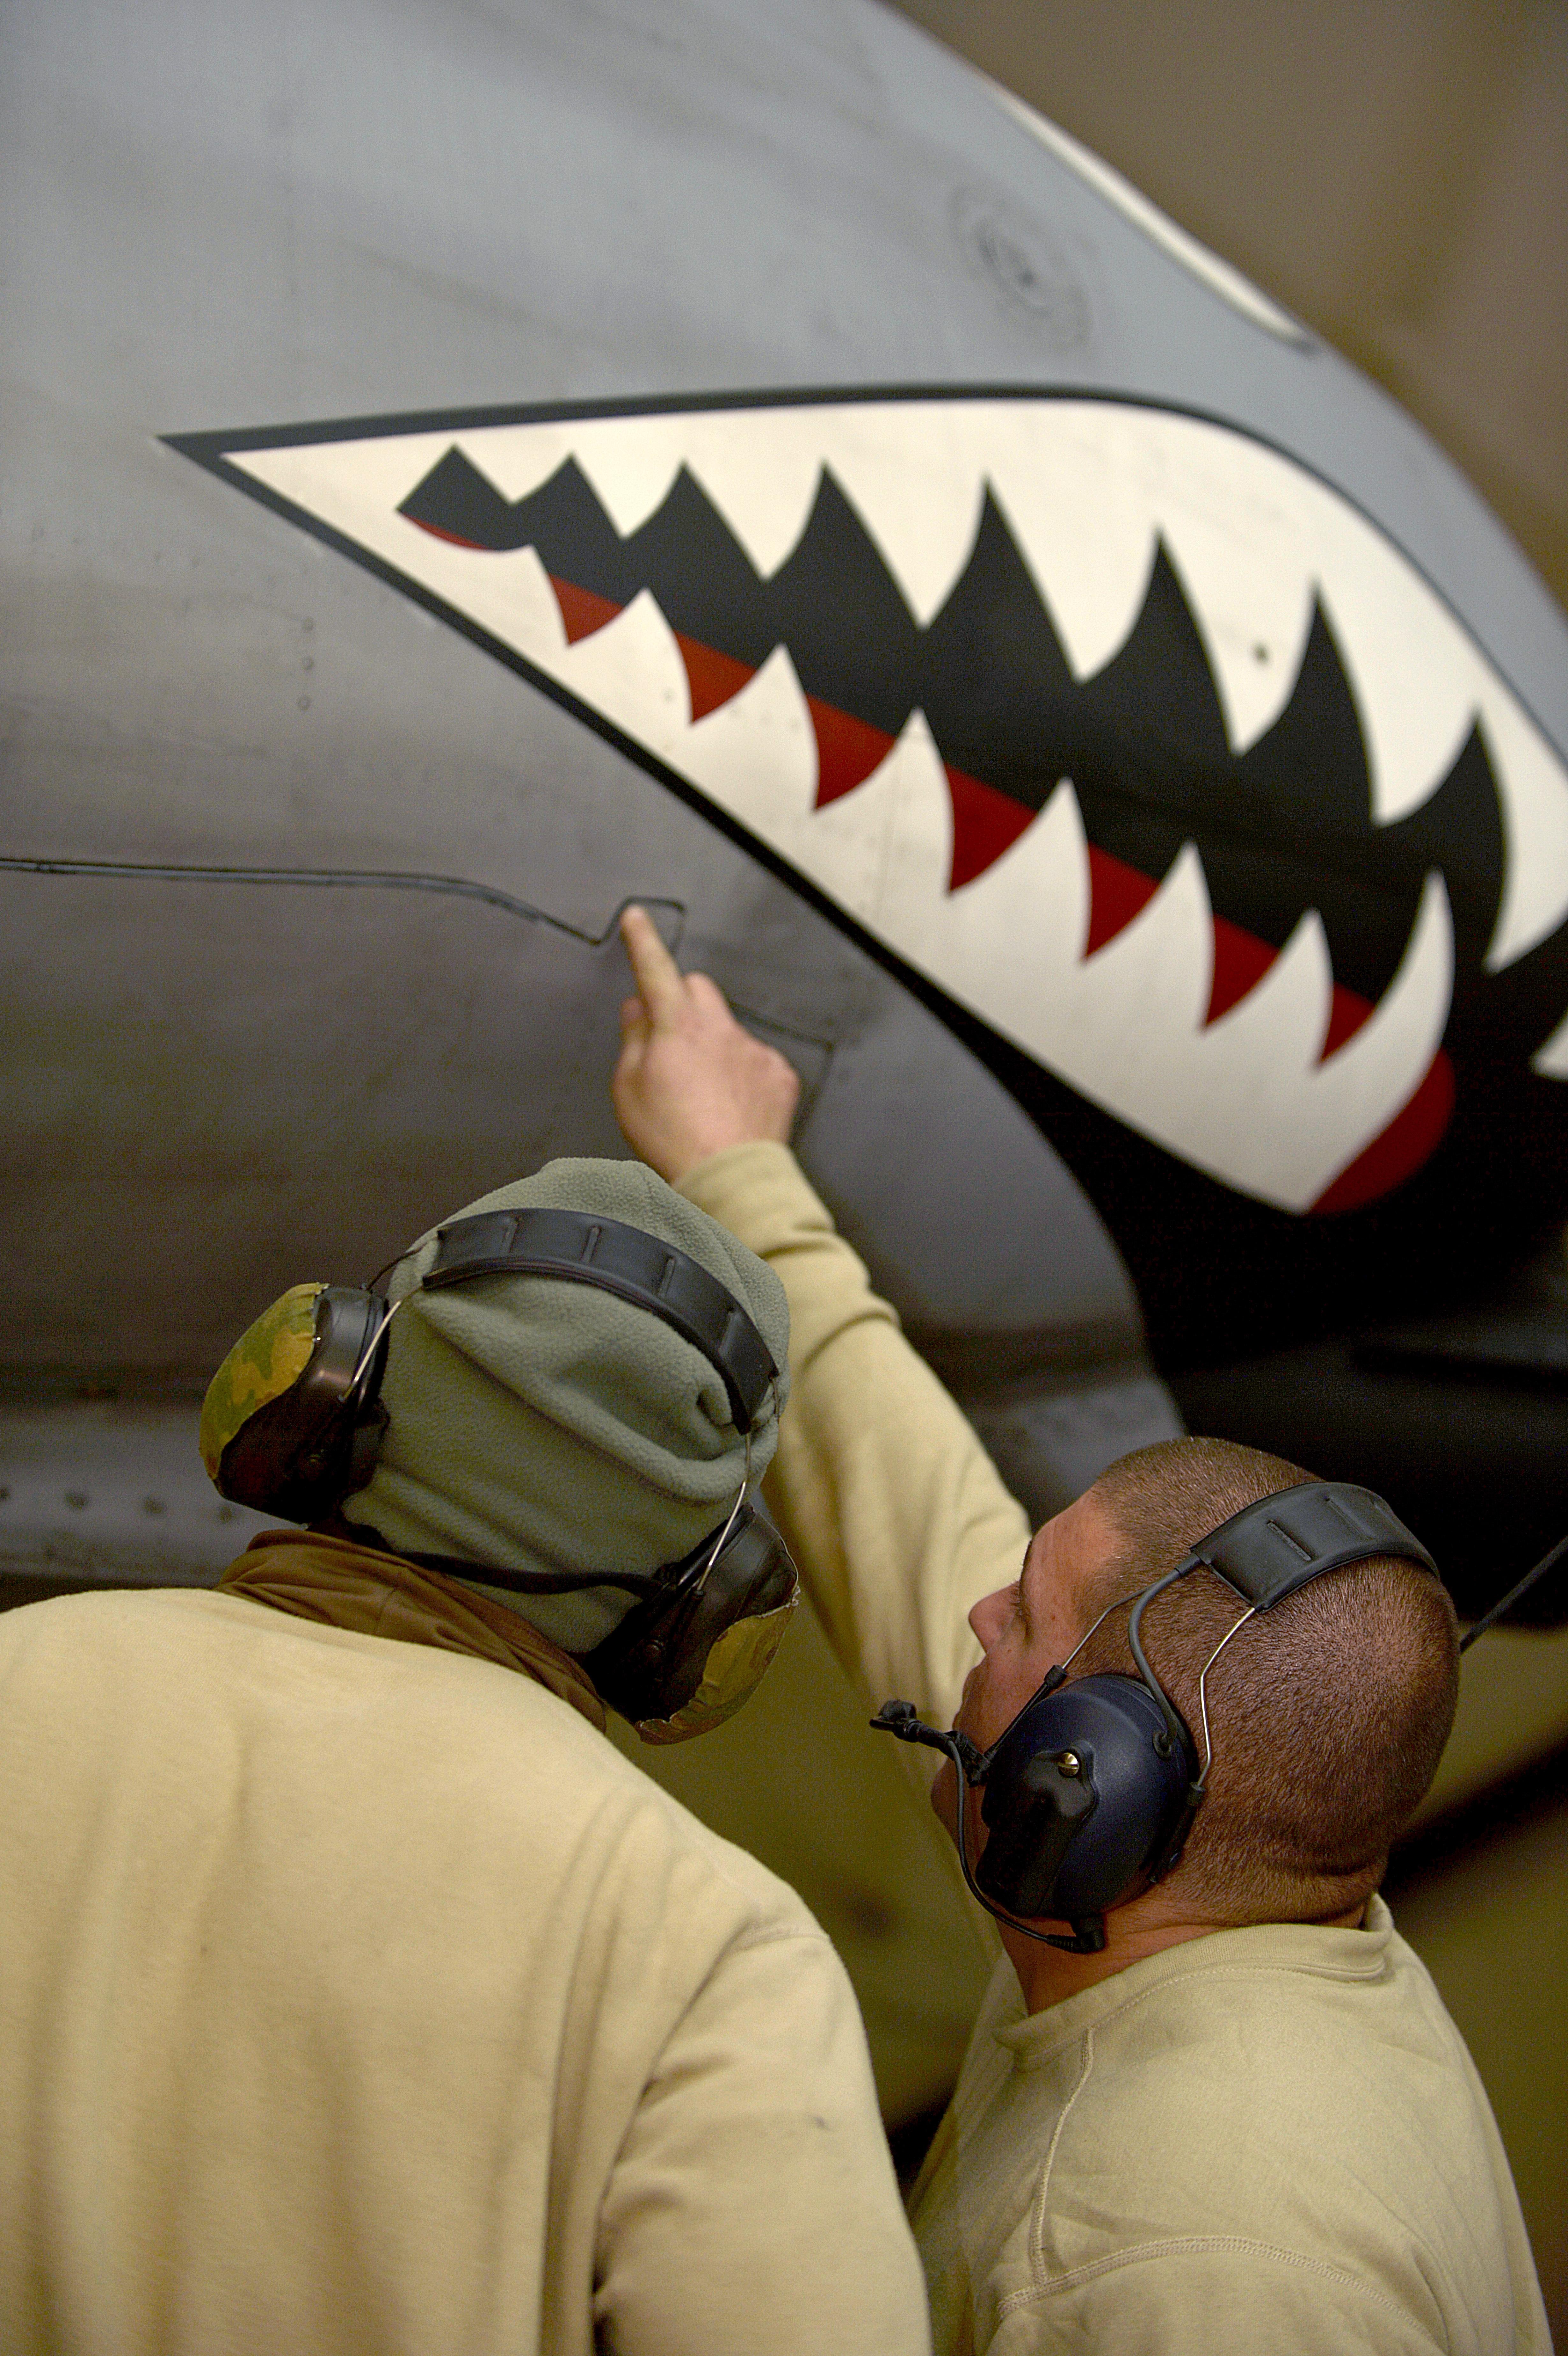 131230 file:u.s. air force senior airman craig irvine, left, a